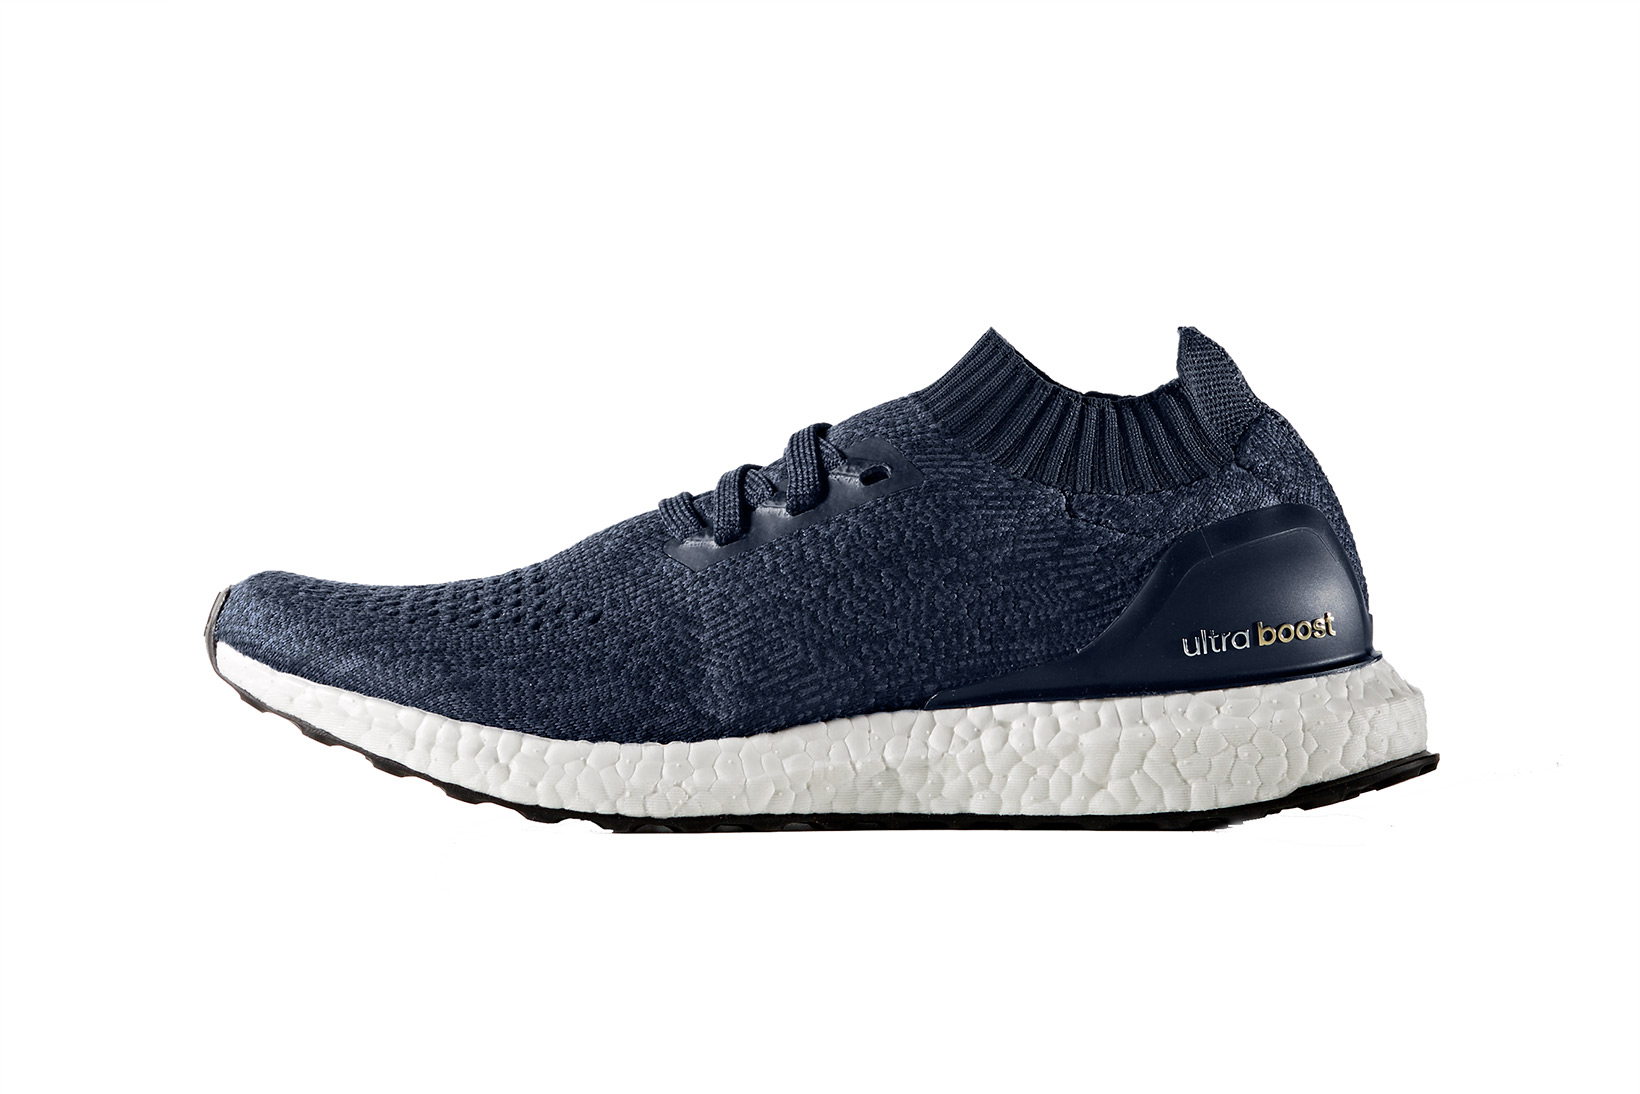 Adidas UltraBOOST 3.0 \u0027Trace Cargo\u0027 BLKDMNDS